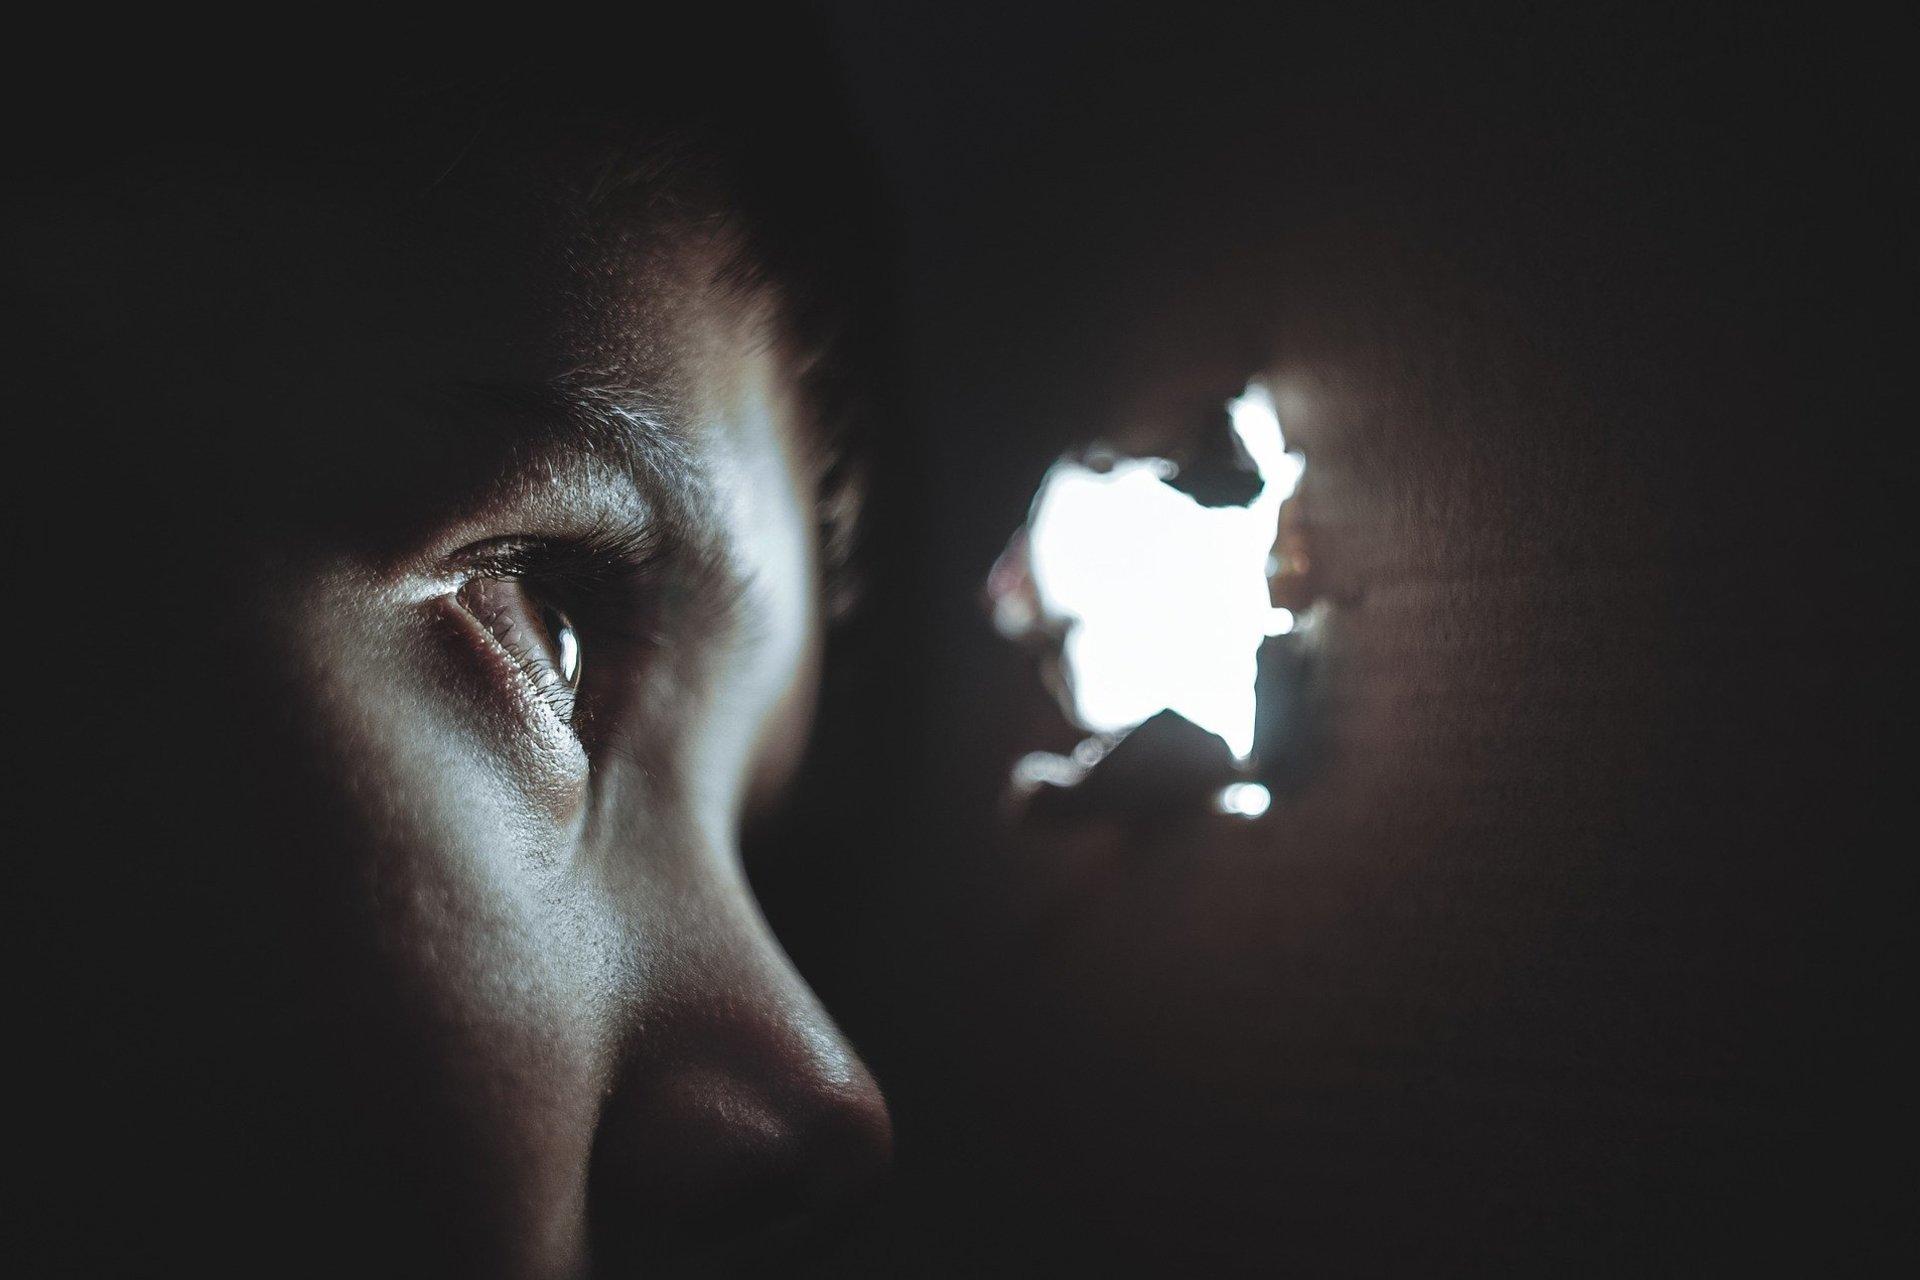 Abuso emotivo abuso psicologico